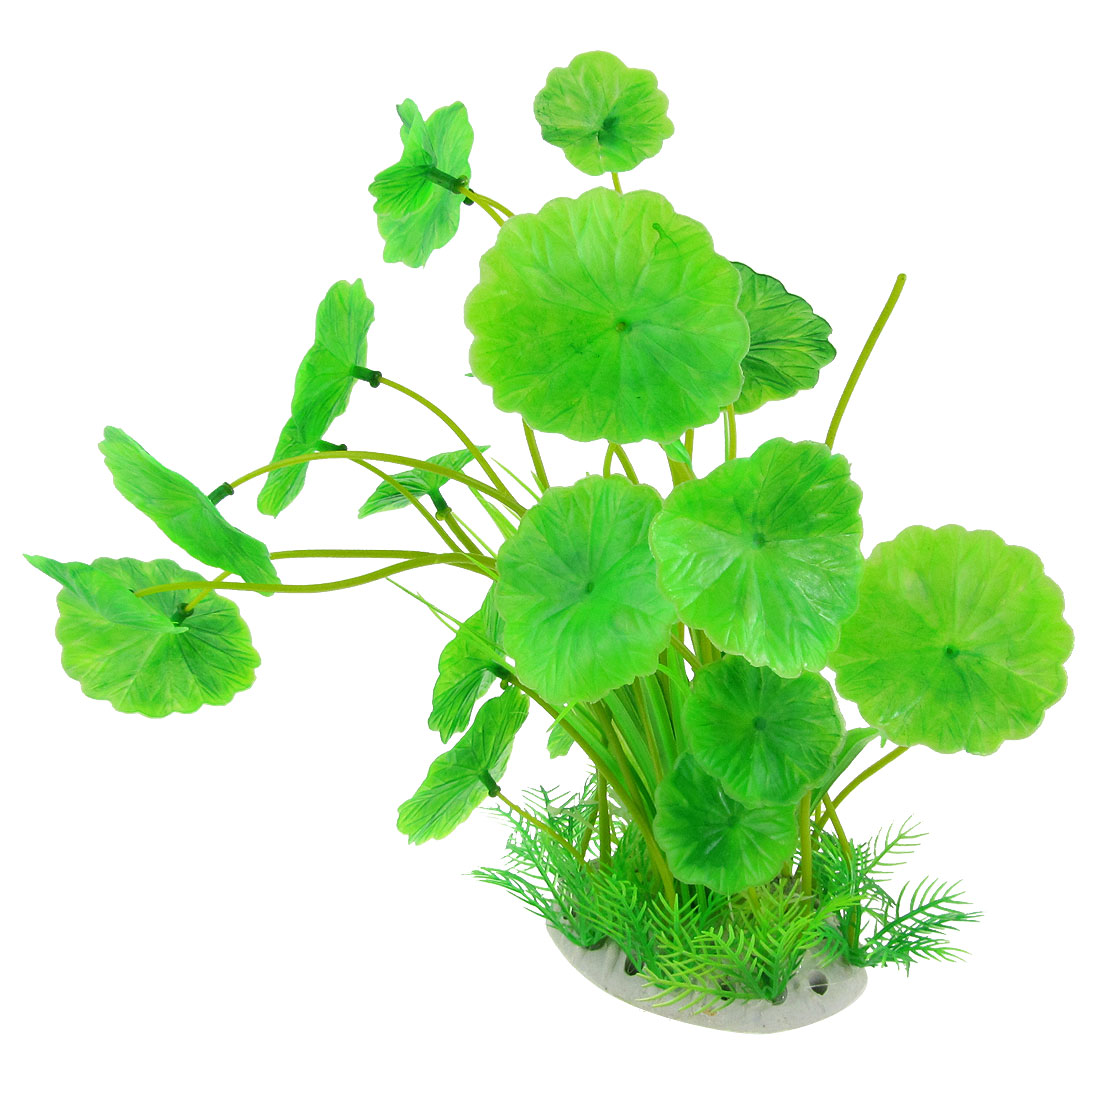 "Fish Tank Green Scalloped Leaves Aquascaping Plastic Plant Decor 11.2"""